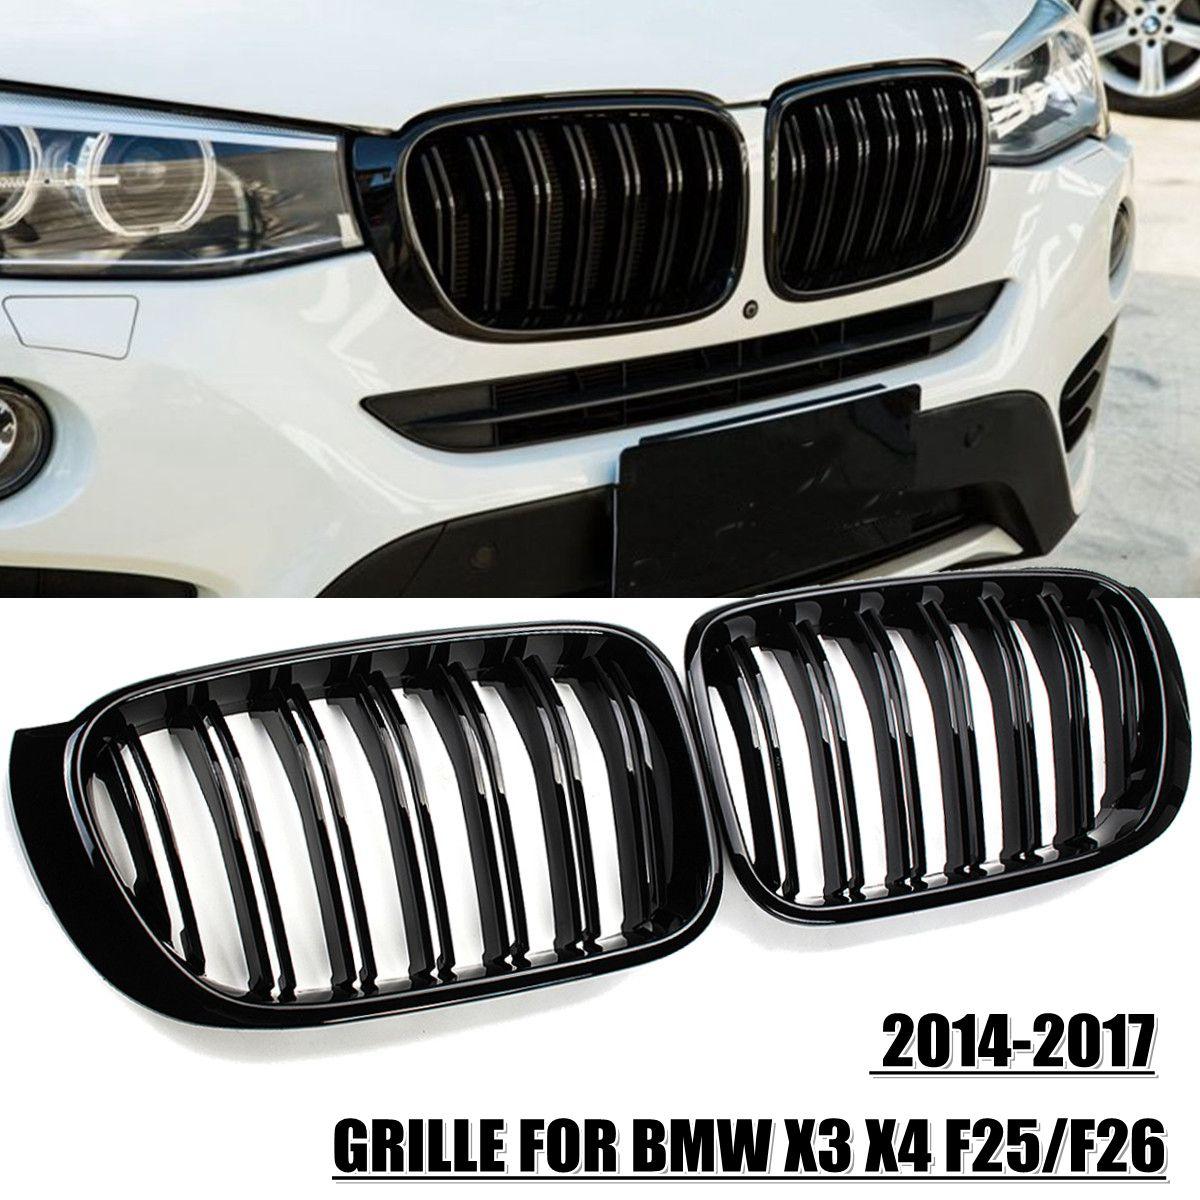 2X M スタイルの車のフロントグリルグリルメッシュネットトリムストリップカバーグロスブラック Bmw X3 X4 F25 F26 2014 2015 2016 2017